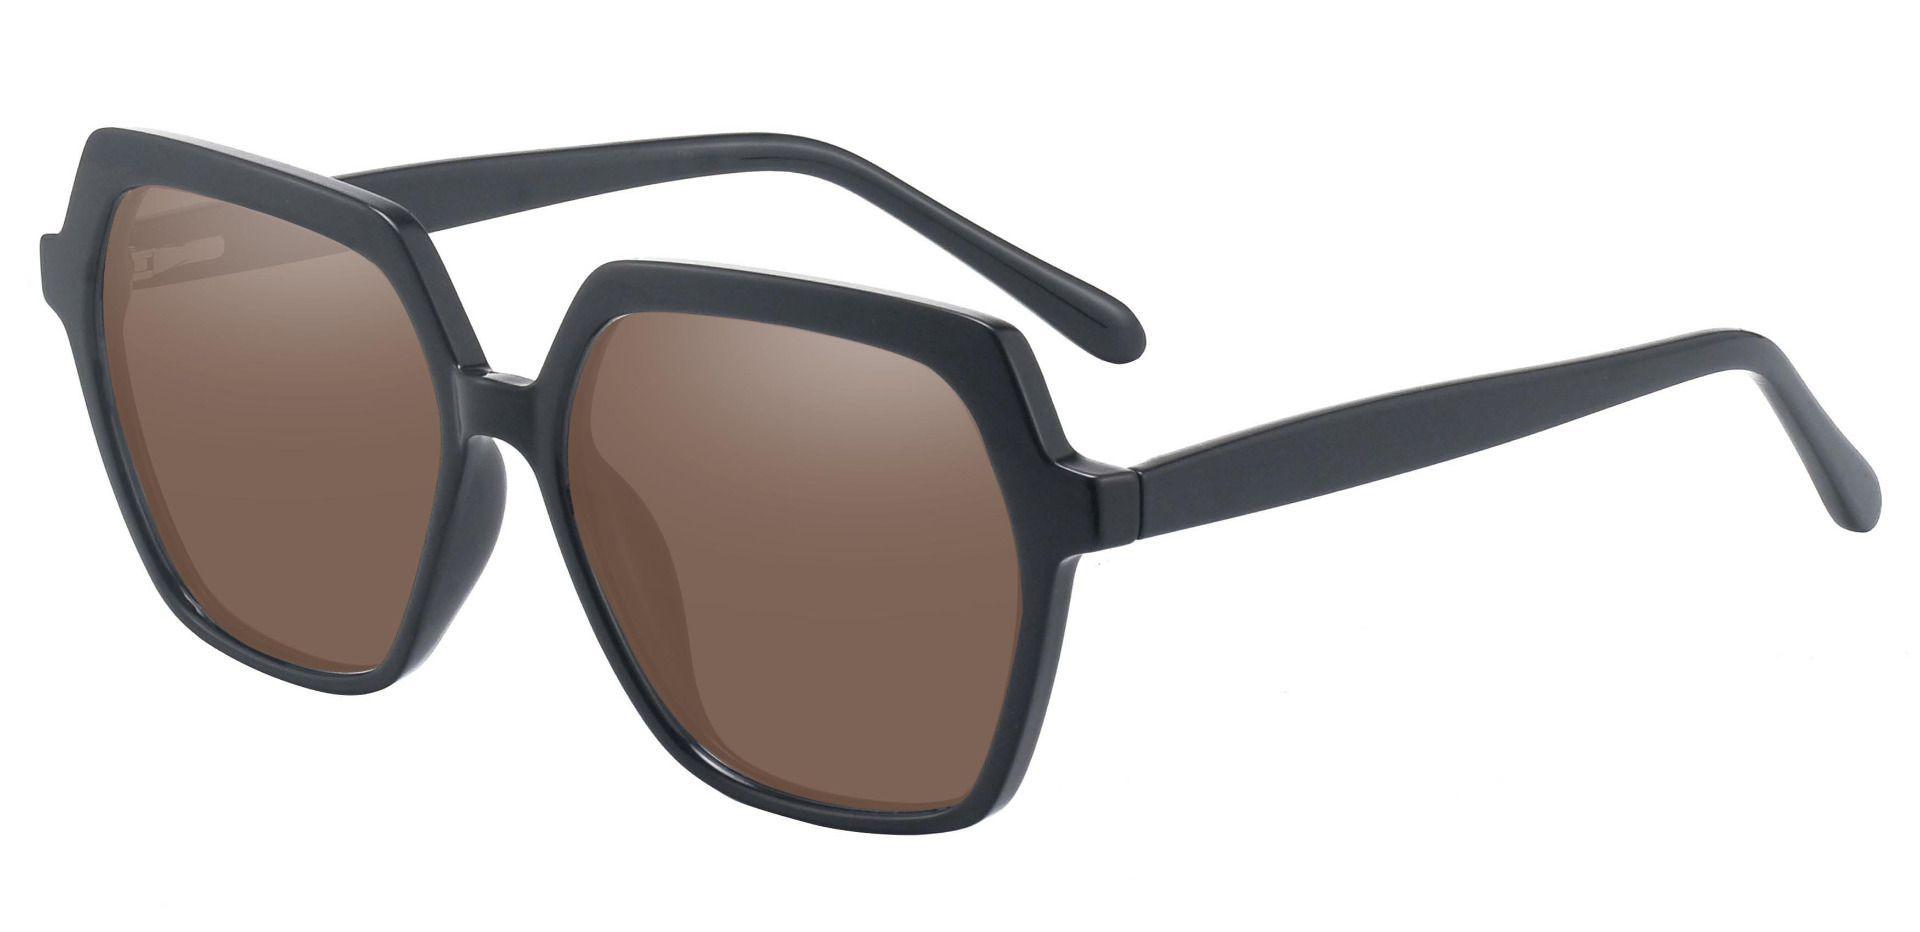 Regent Geometric Reading Sunglasses - Black Frame With Brown Lenses